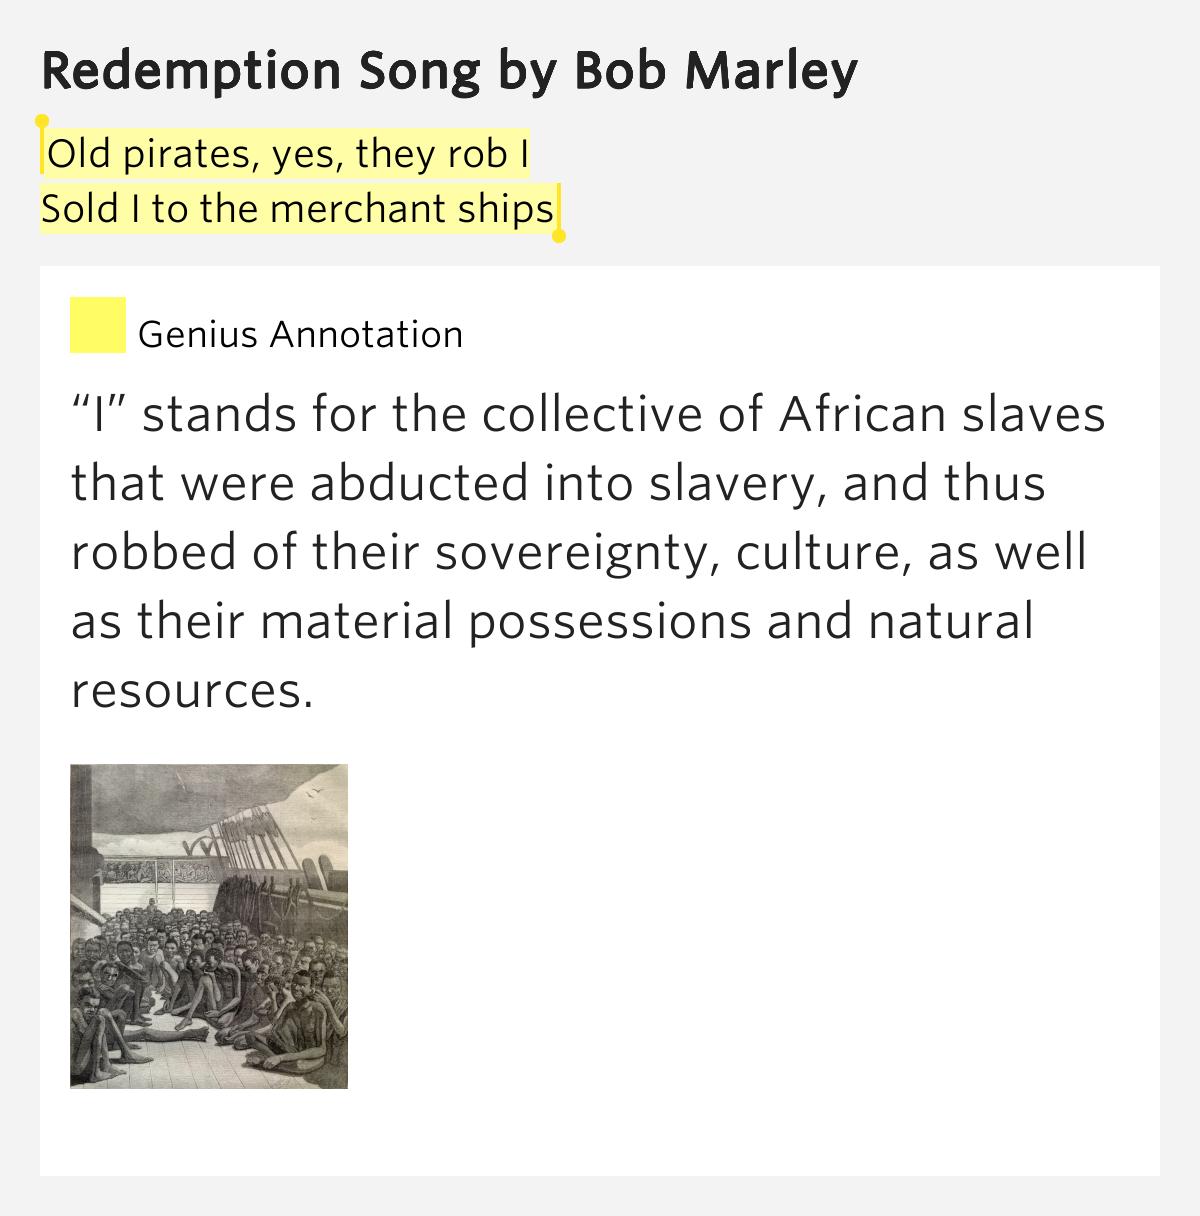 bob marley redemption song lyrics pdf